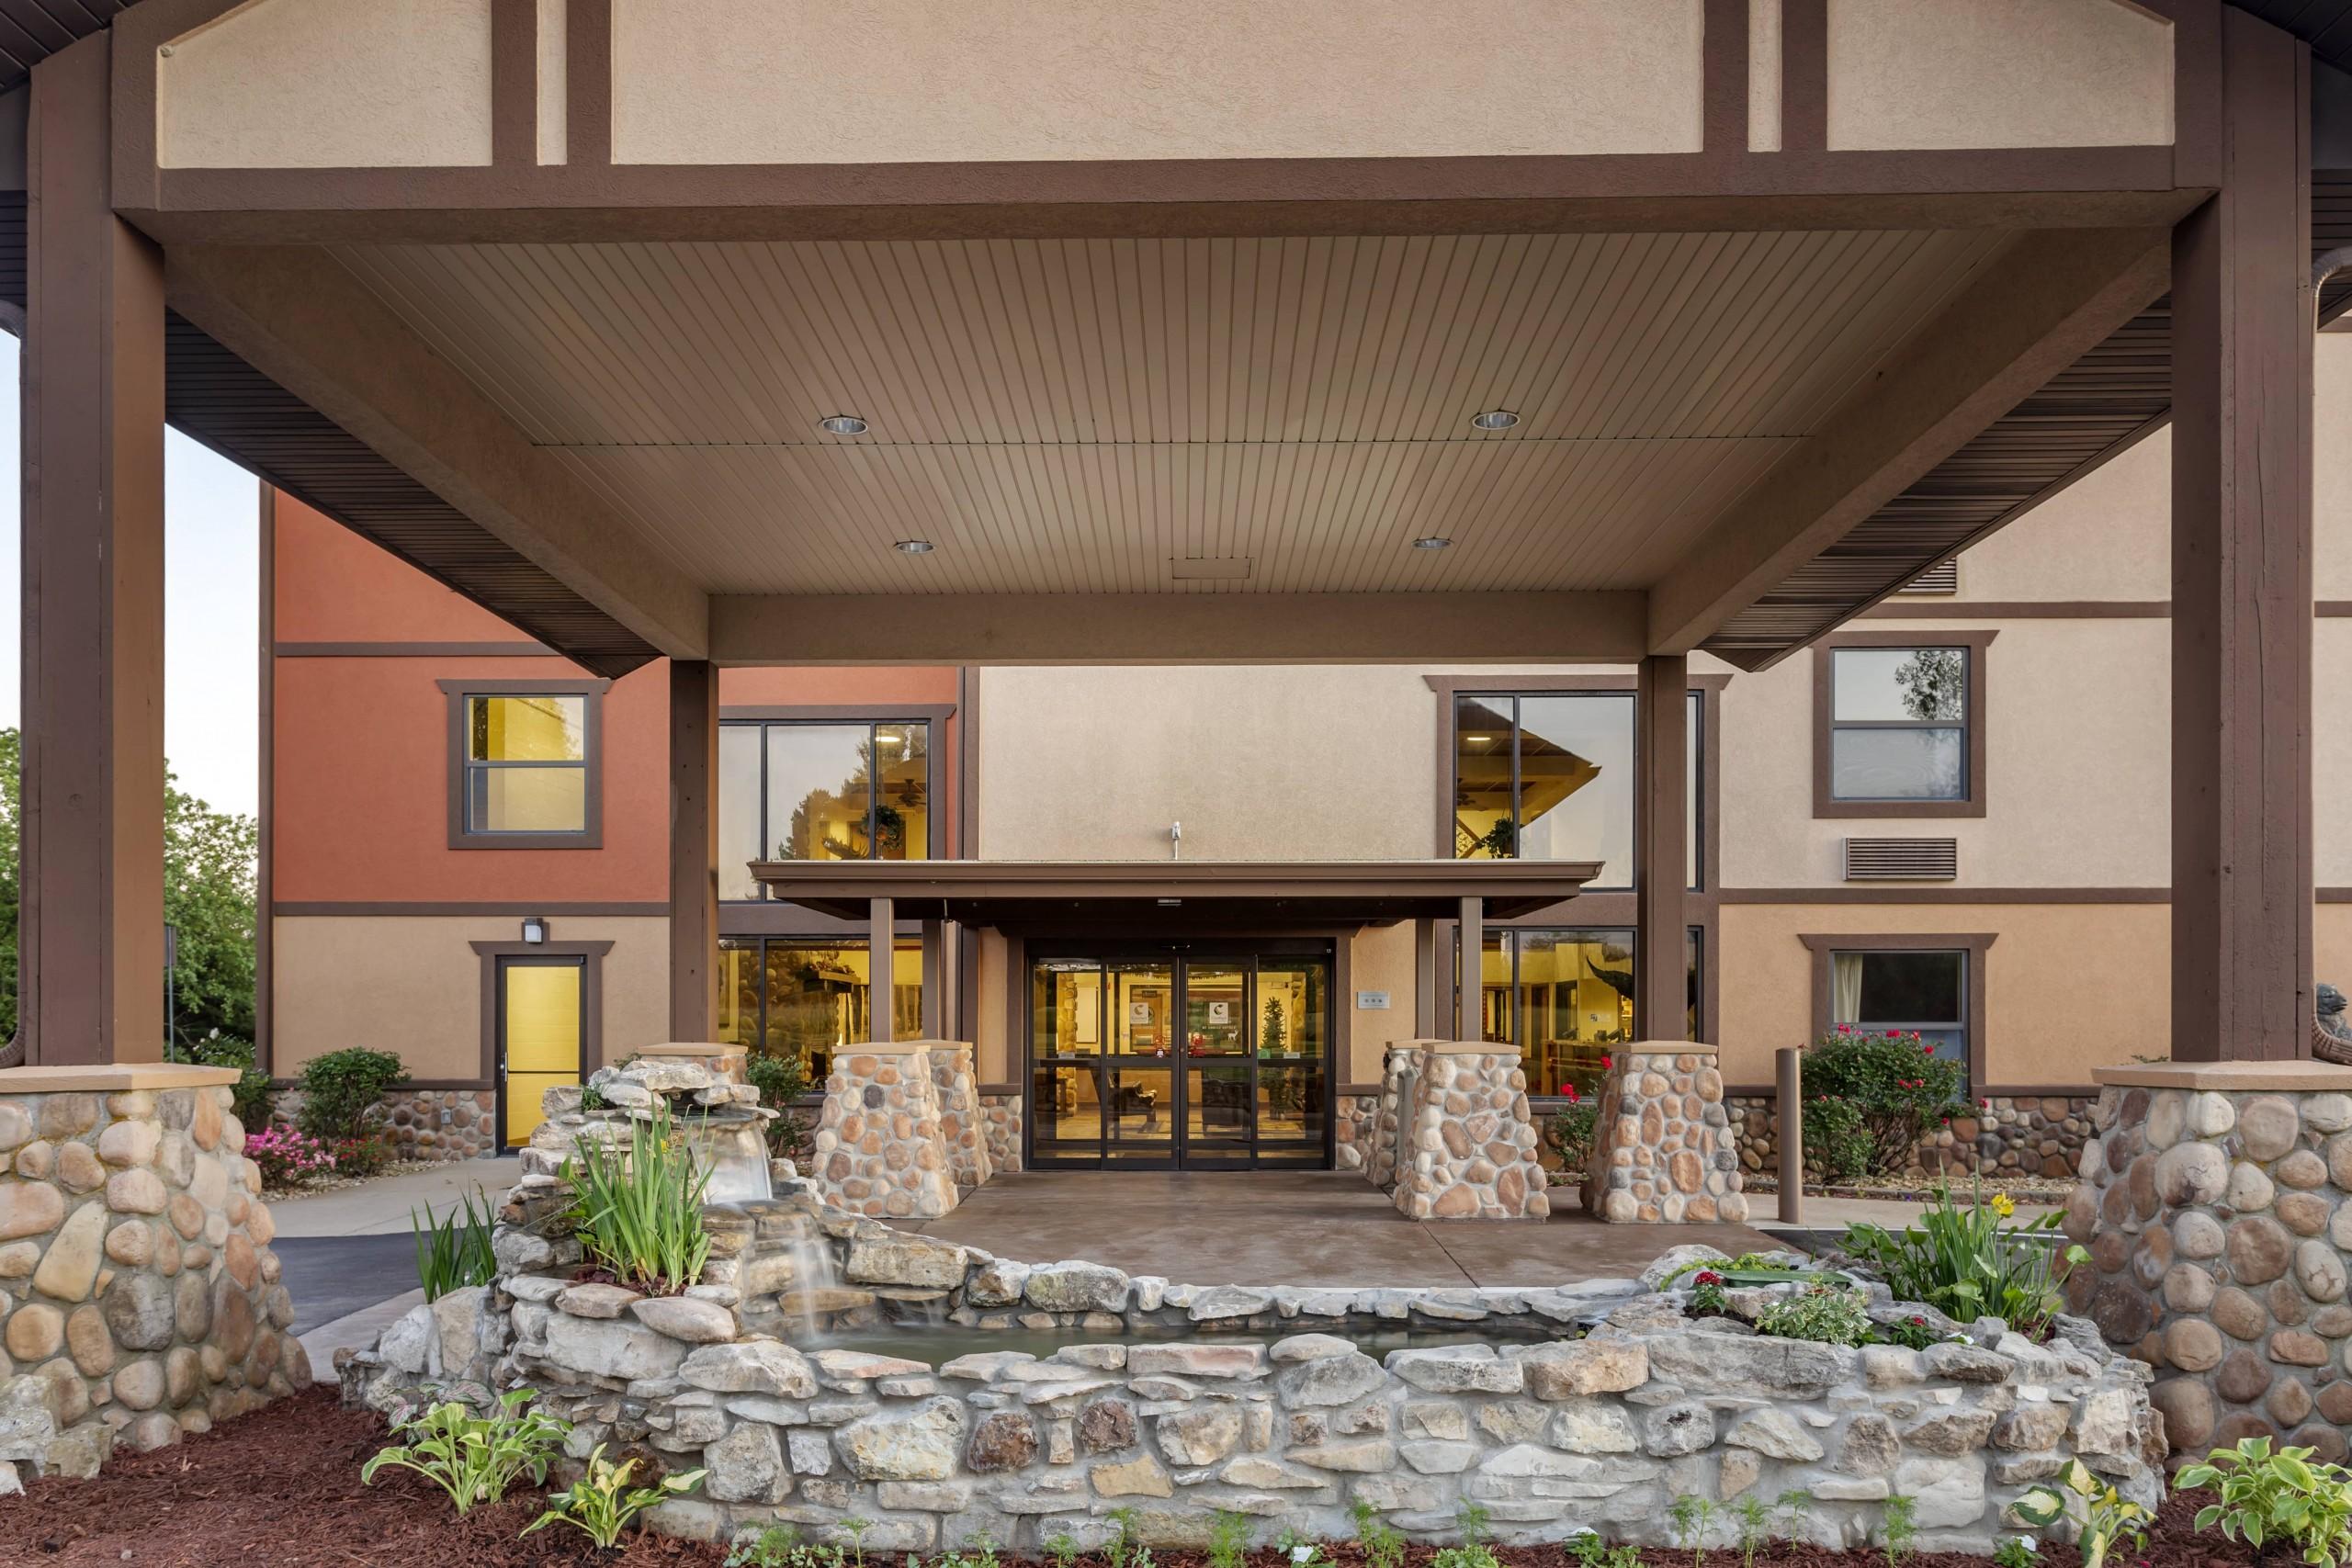 Comfort Inn & Suites Branson Meadows Entry